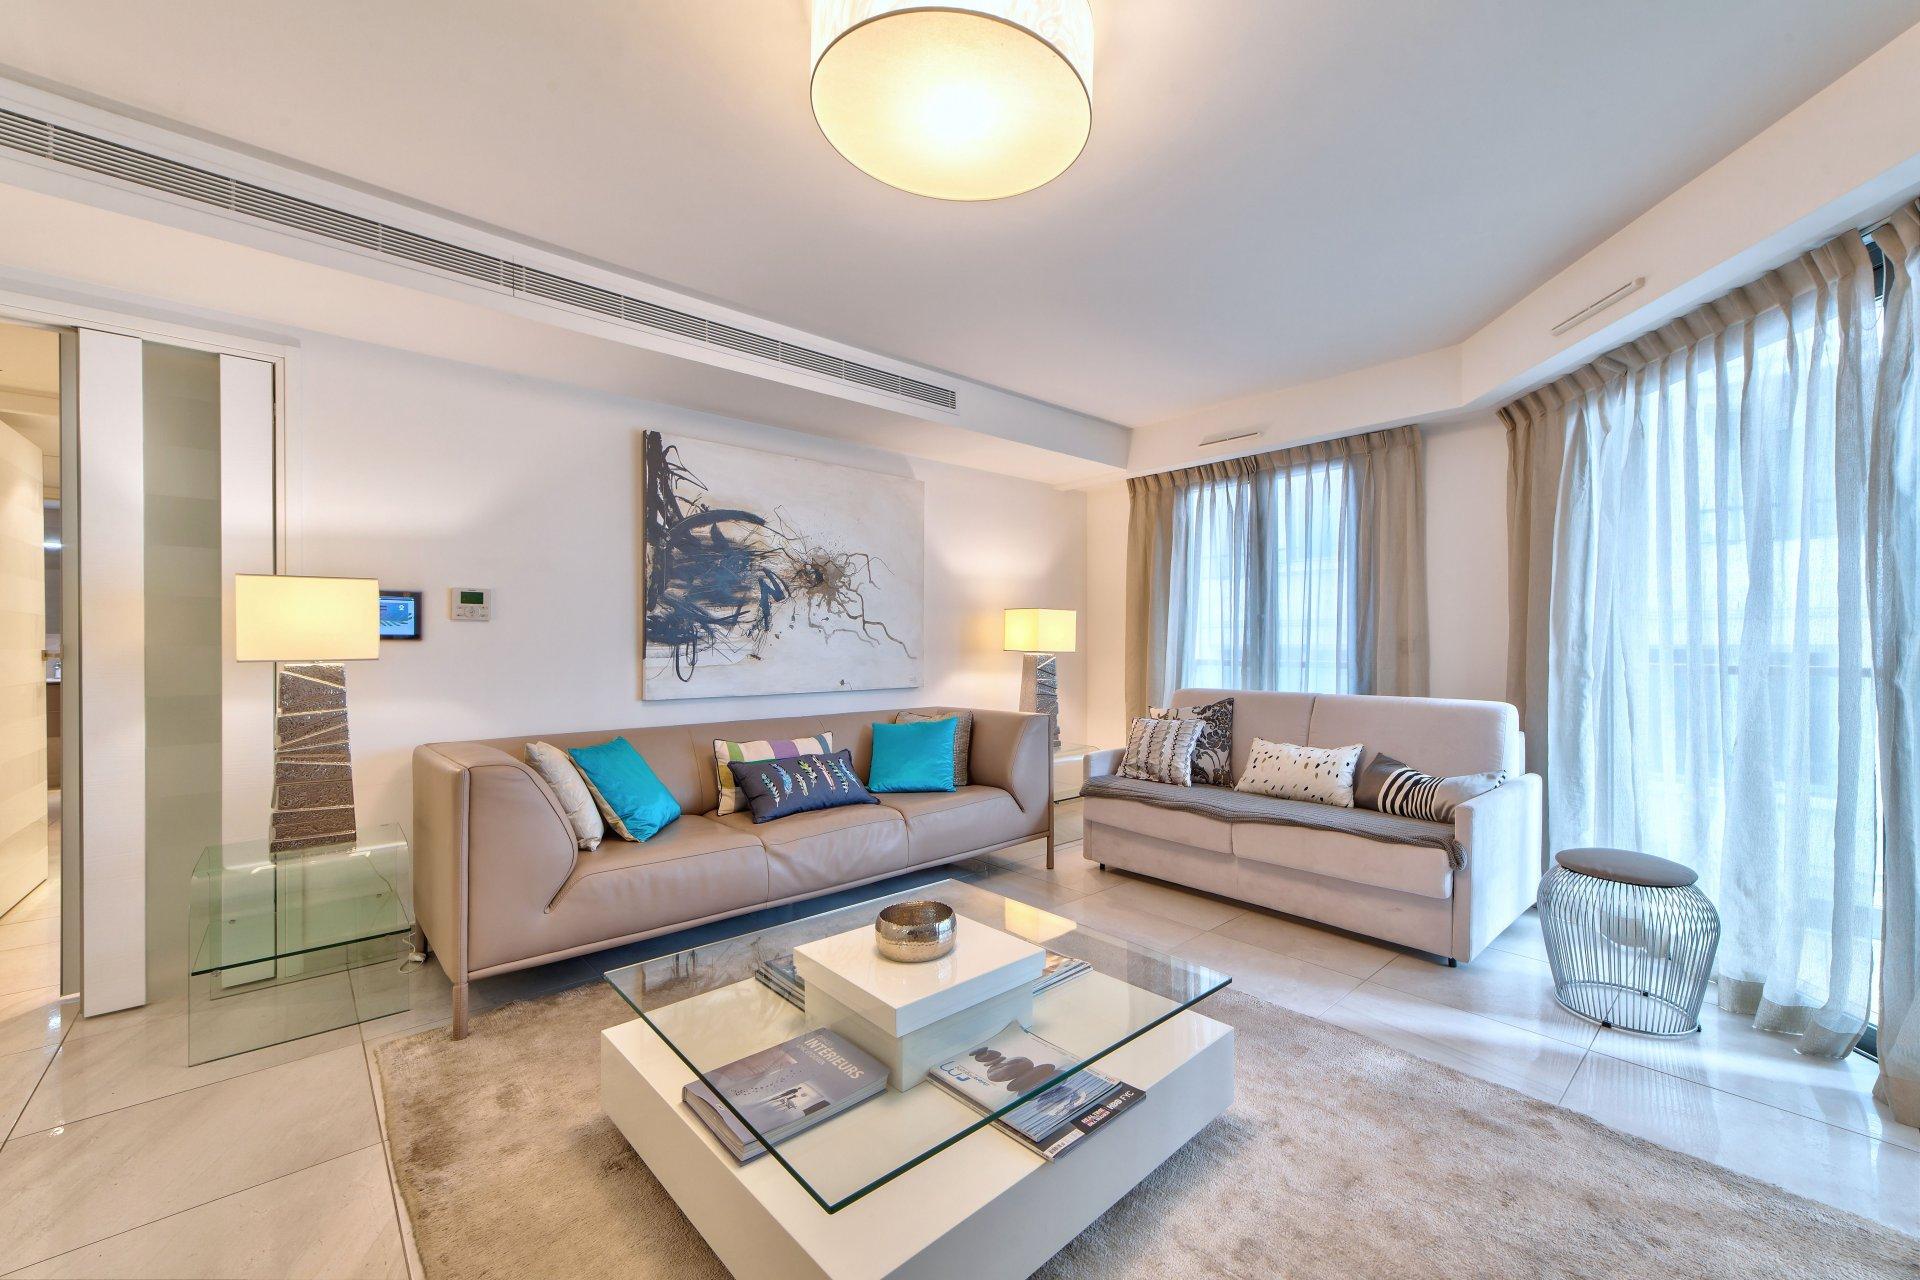 Exceptionnel appartement neuf Cannes Croisette. Rare!